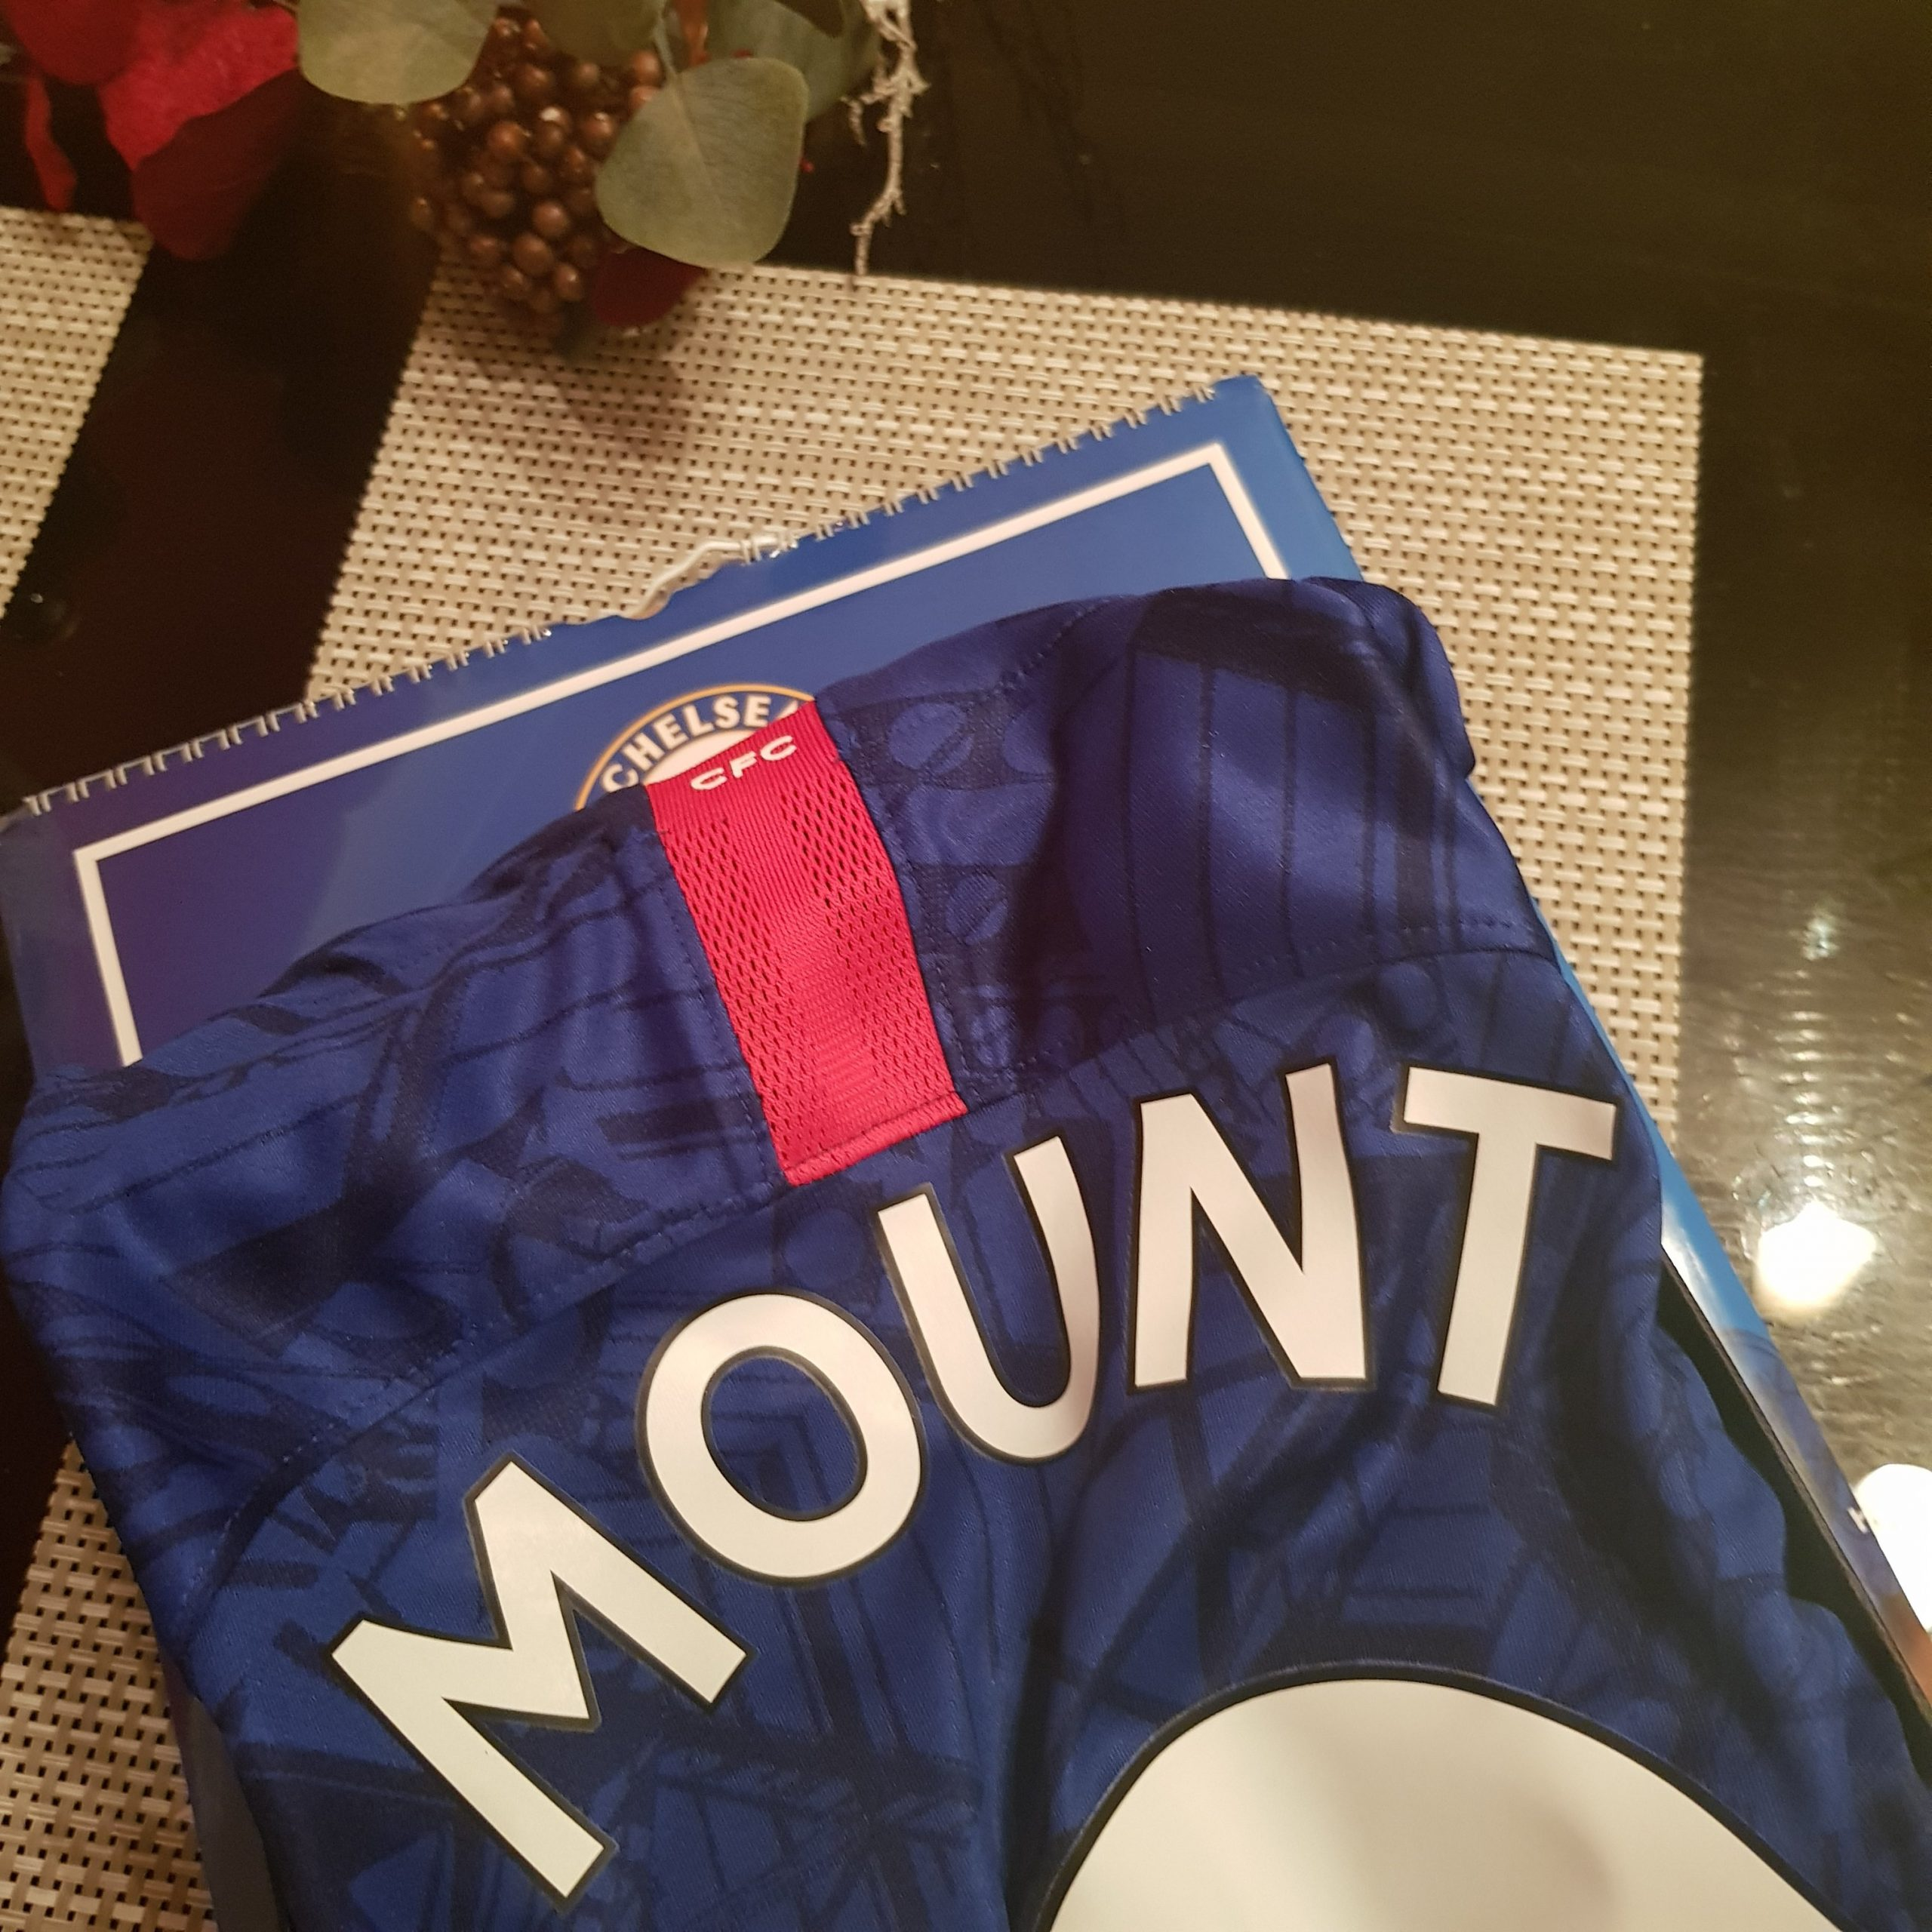 Chelsea shirt